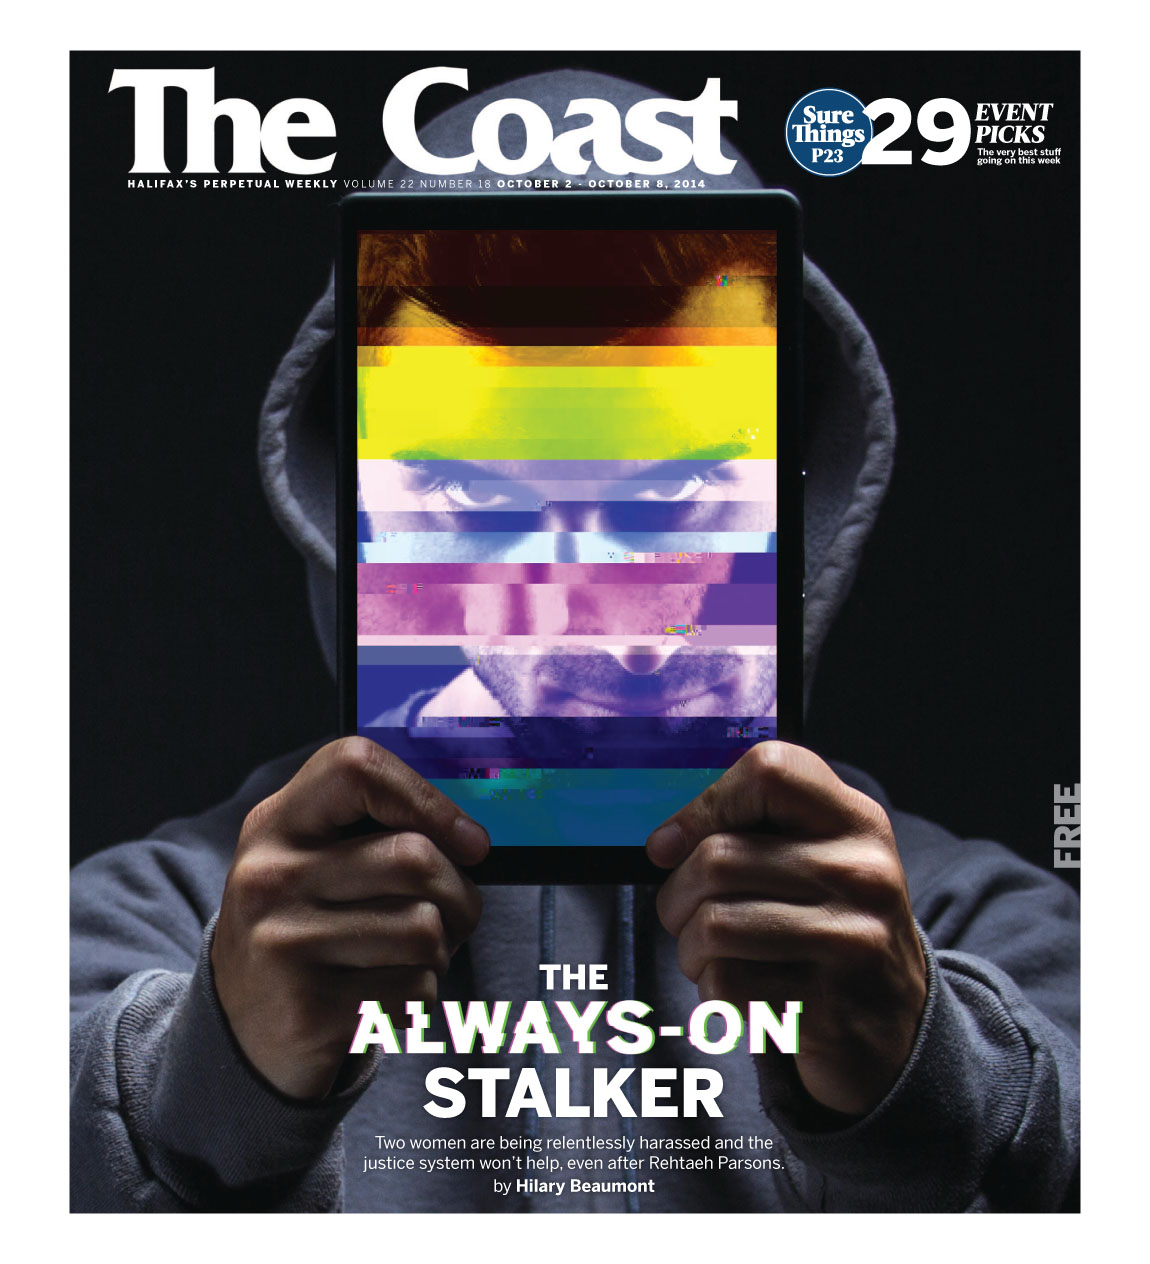 The Coast: The Always-On Stalker